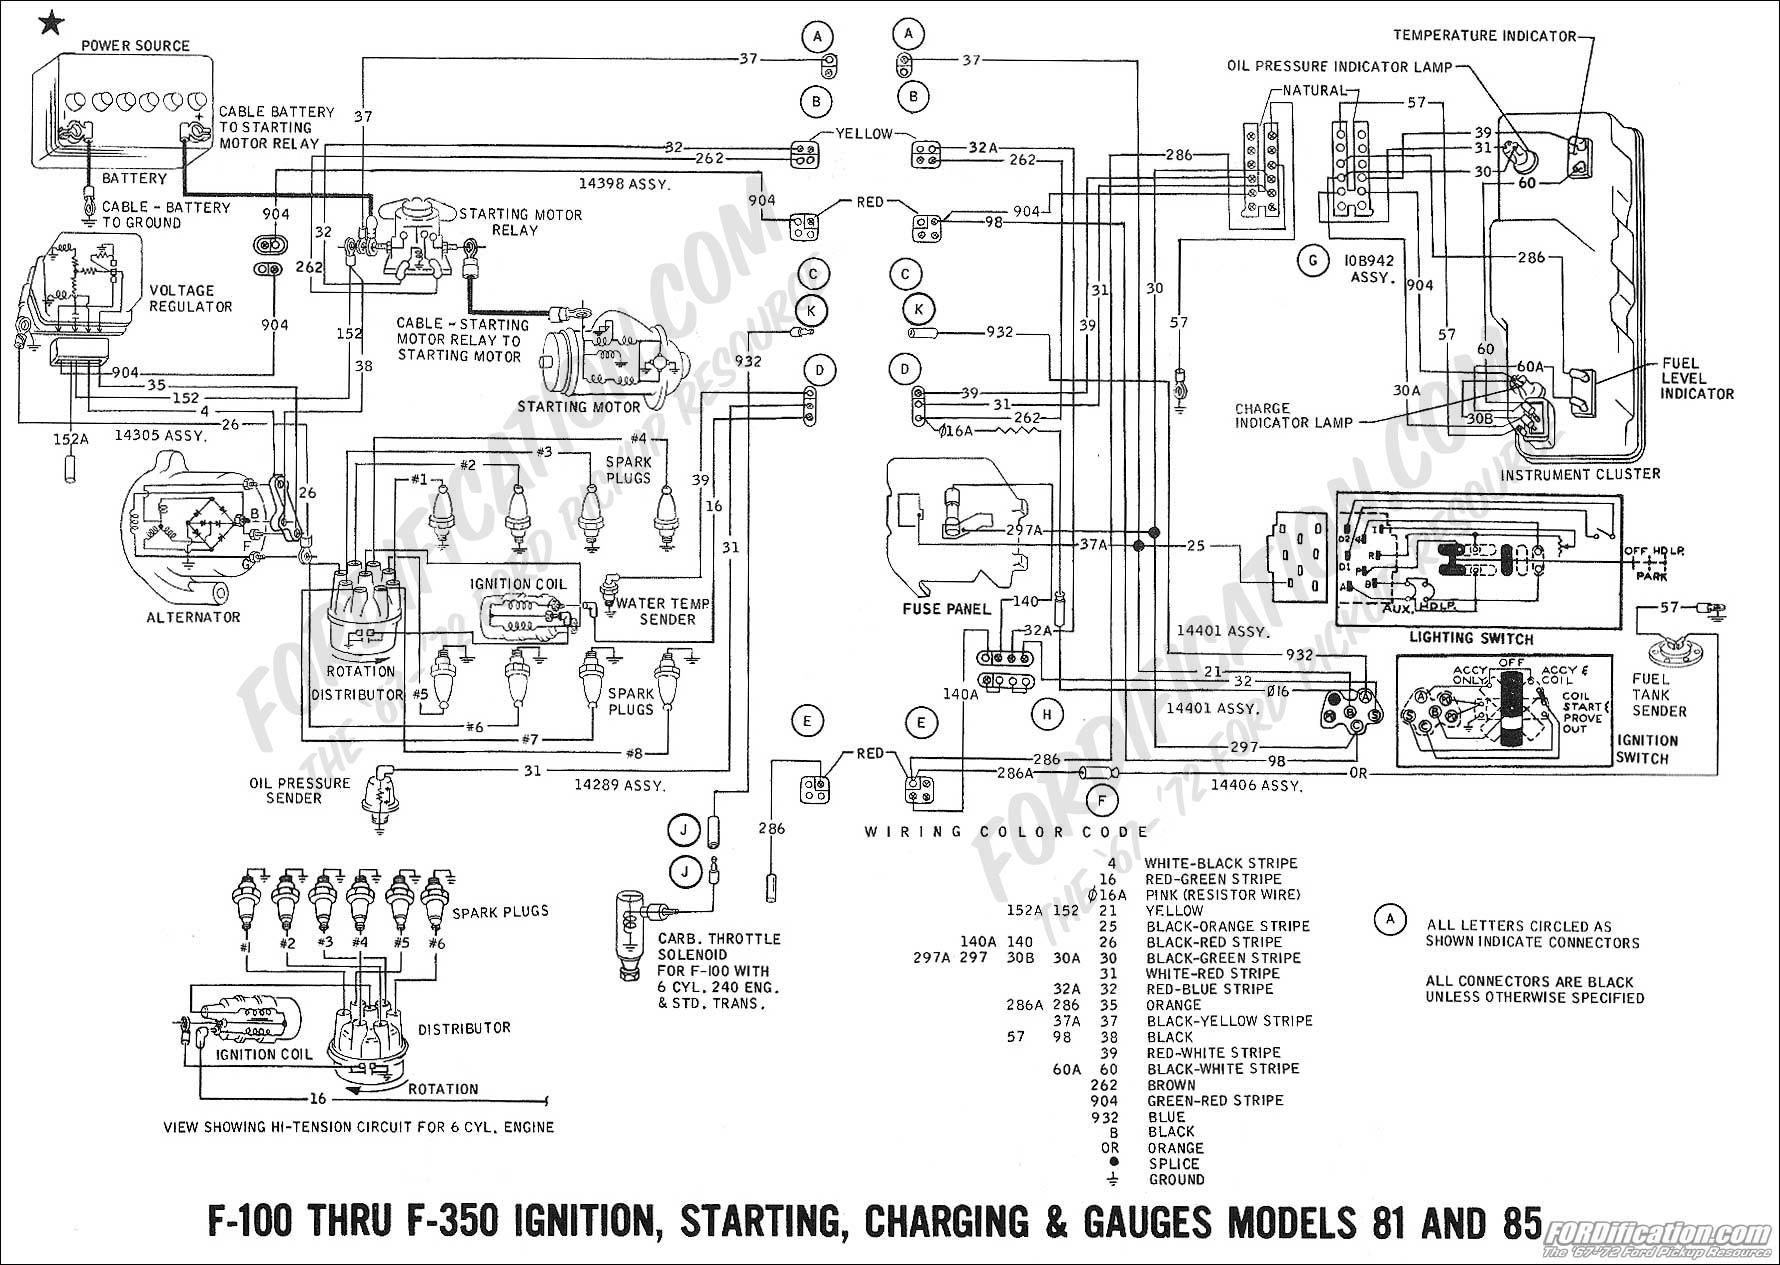 Enjoyable Coil Wiring Diagram 1990 Gmc 350 Basic Electronics Wiring Diagram Wiring Cloud Gufailluminateatxorg